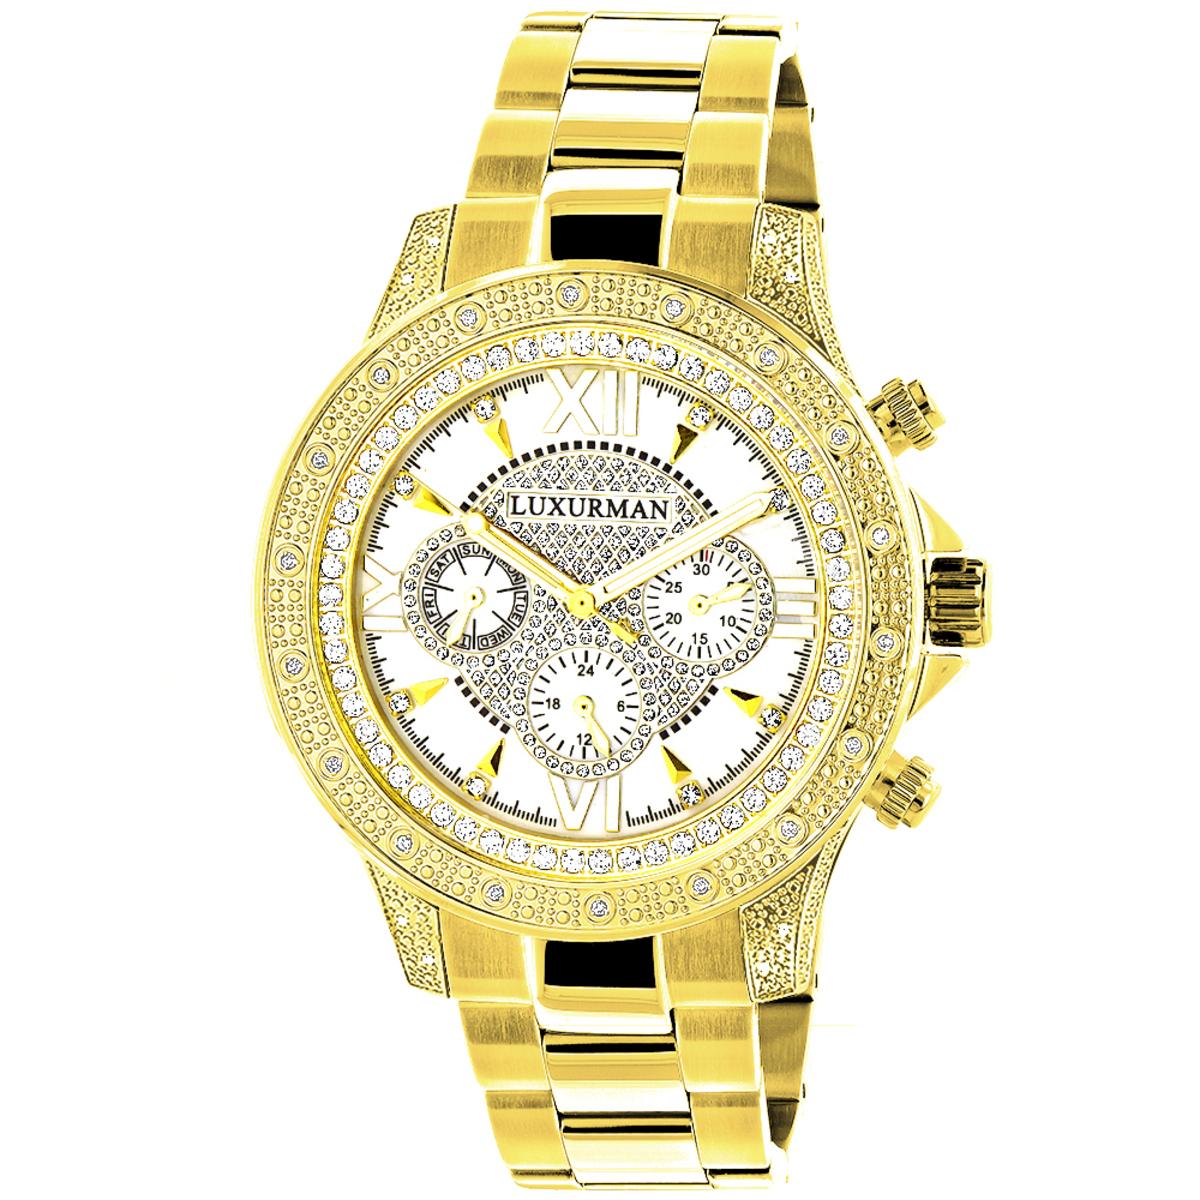 Luxurman Watches: Mens Diamond Watch 0.5ct Yellow Gold Plated